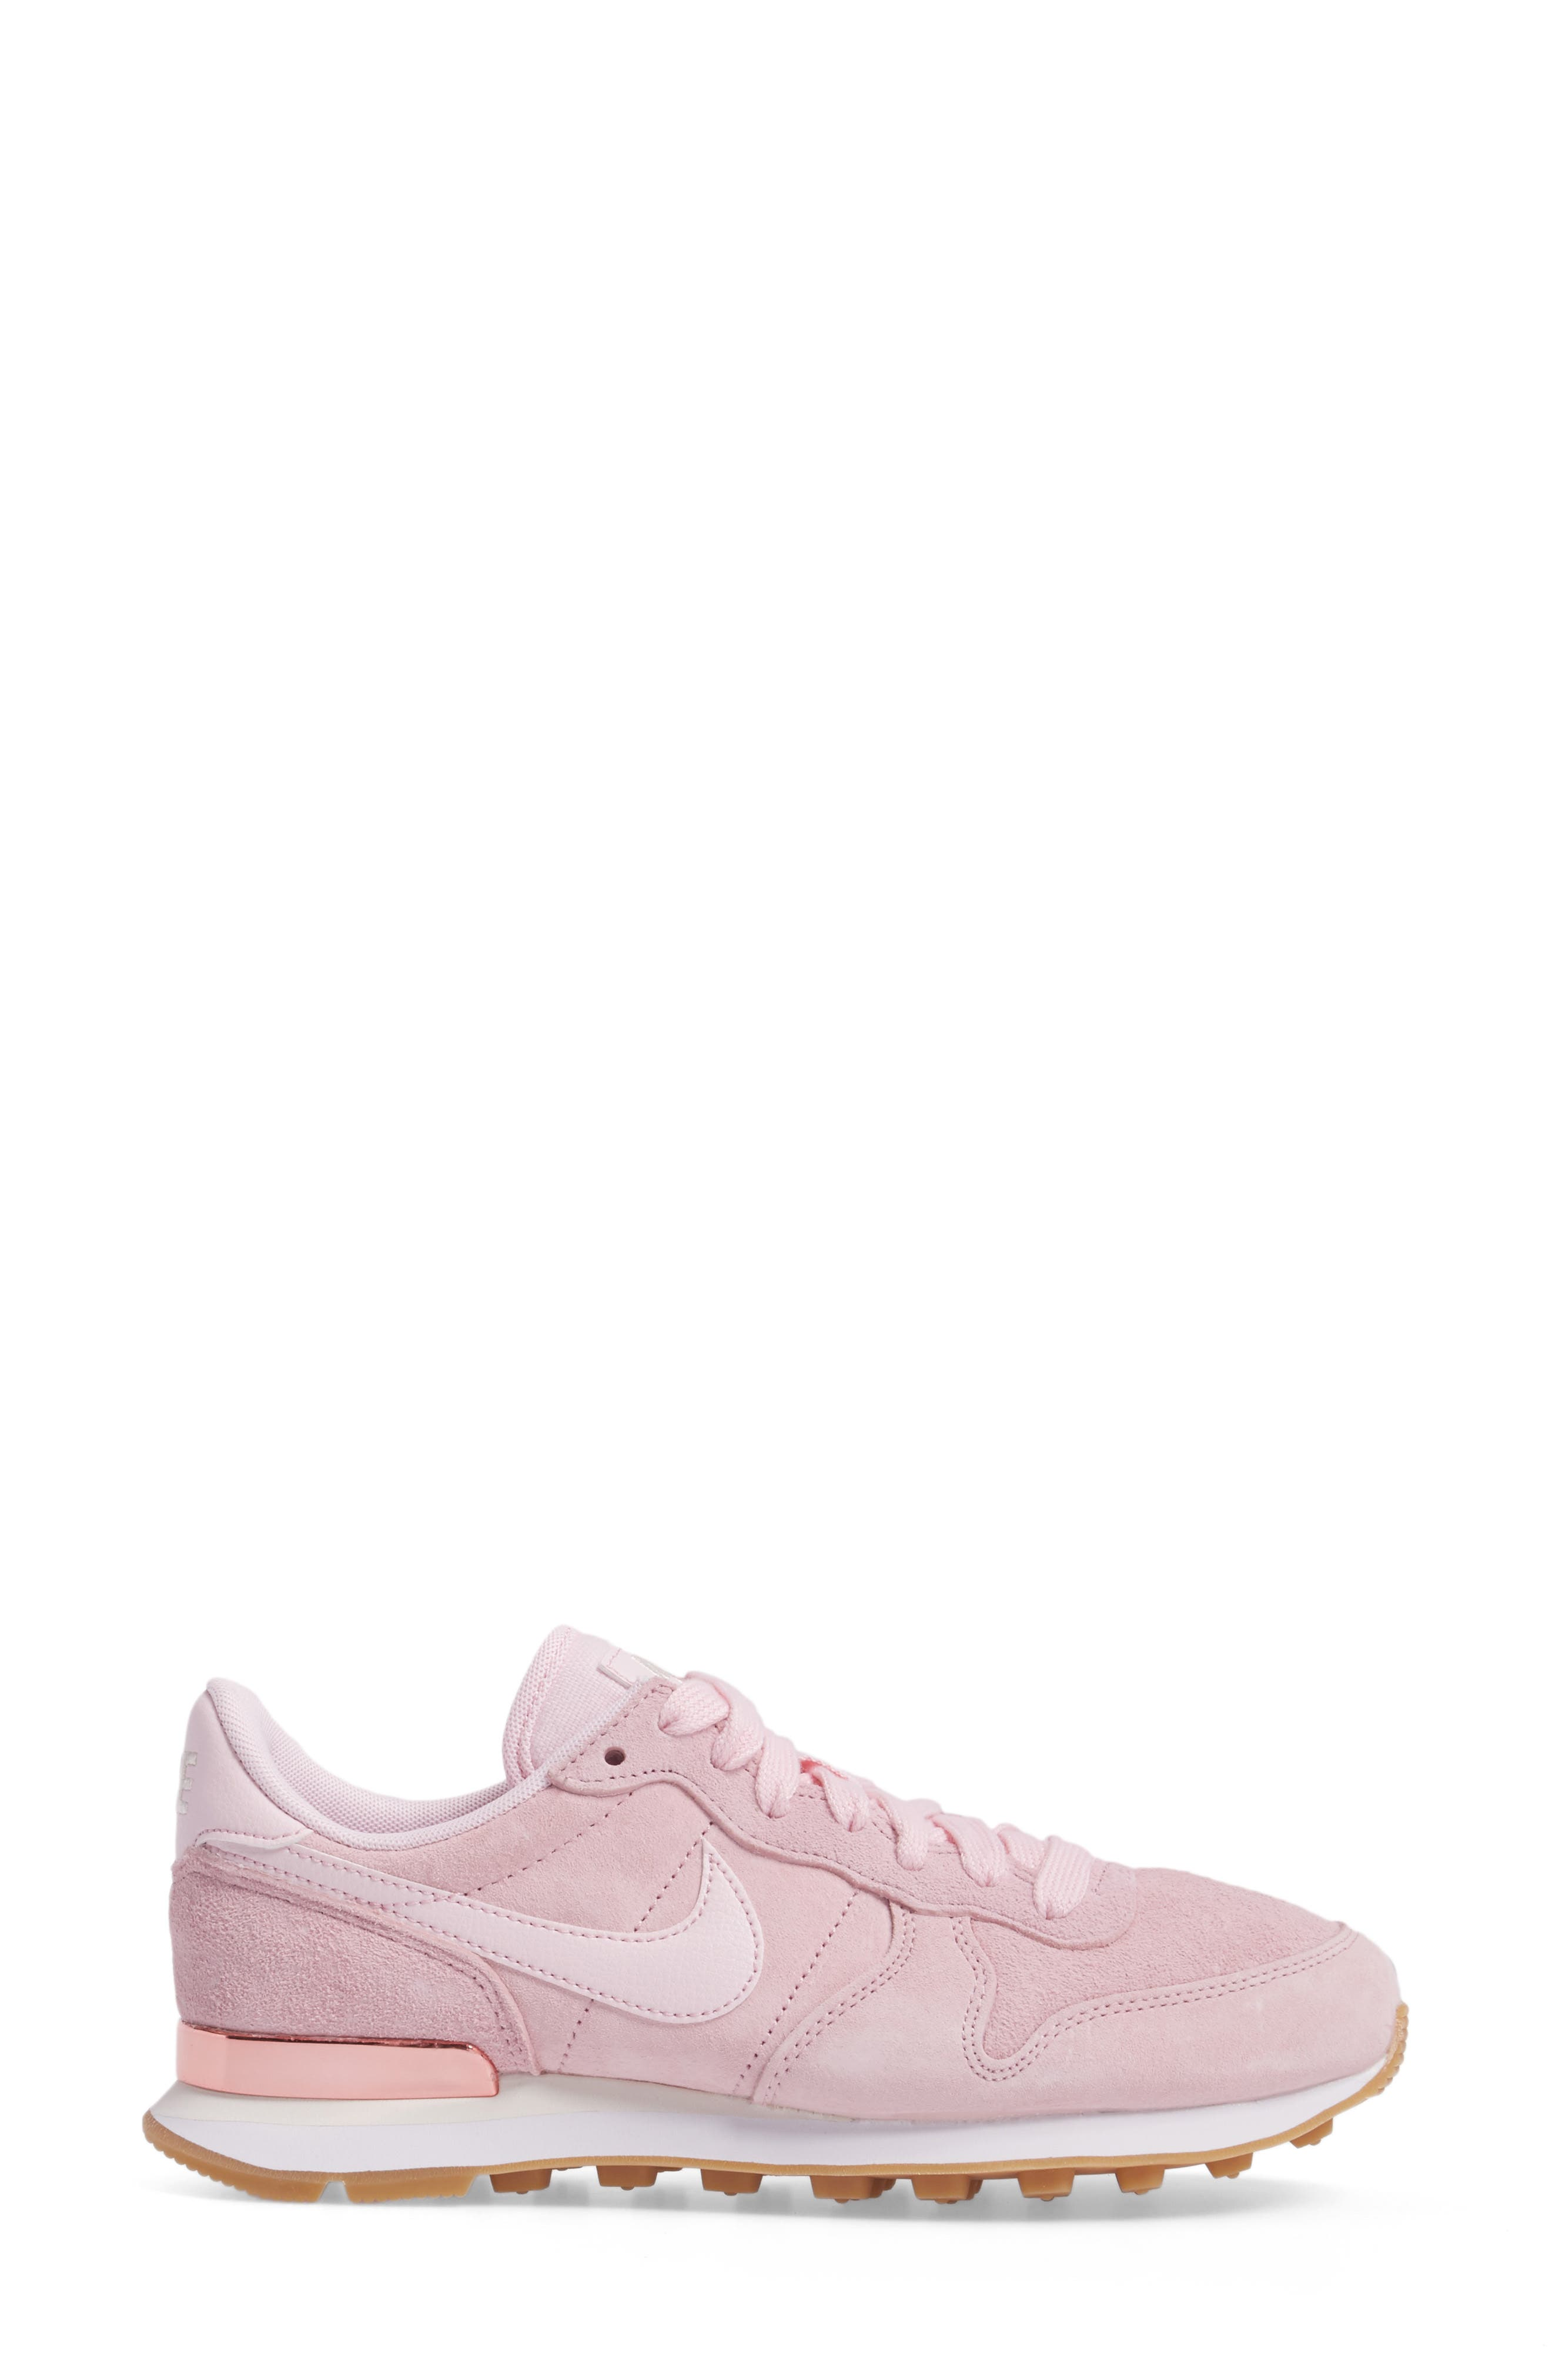 Internationalist SD Sneaker,                             Alternate thumbnail 3, color,                             Prism Pink/ Prism Pink